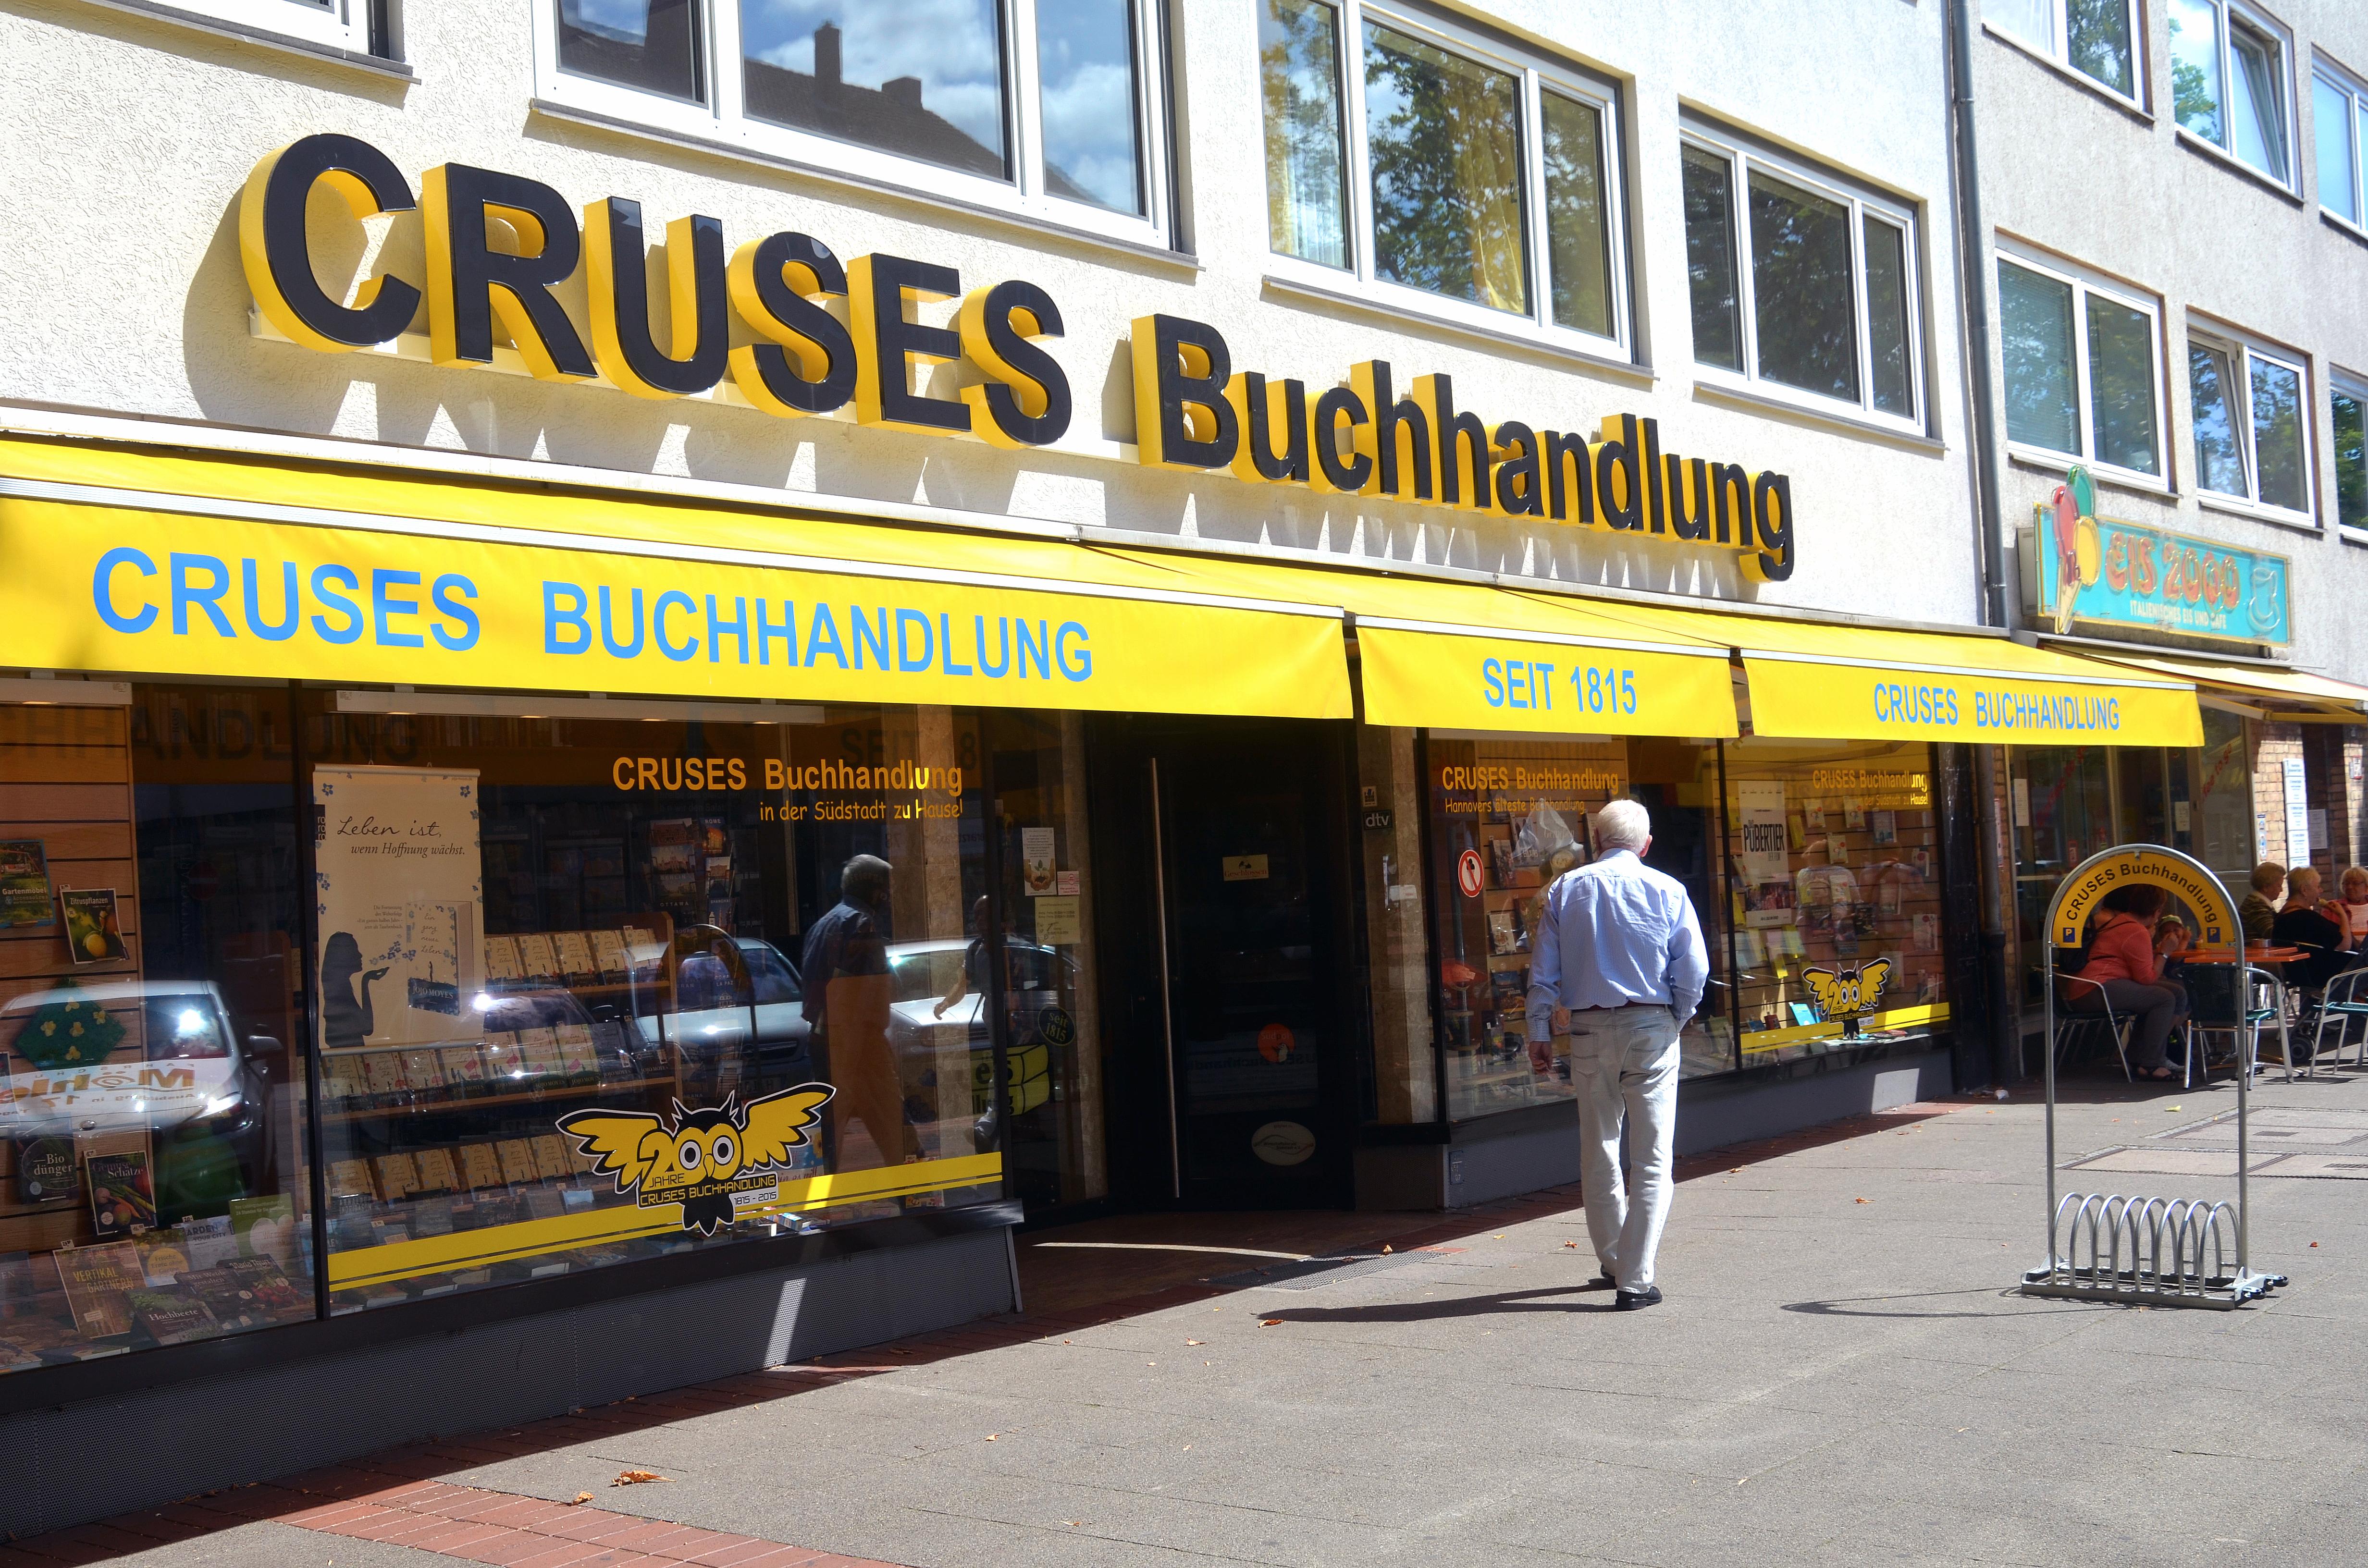 Hannover Outlet file cruses buchhandlung hauptgeschäft hildesheimer straße 75 in